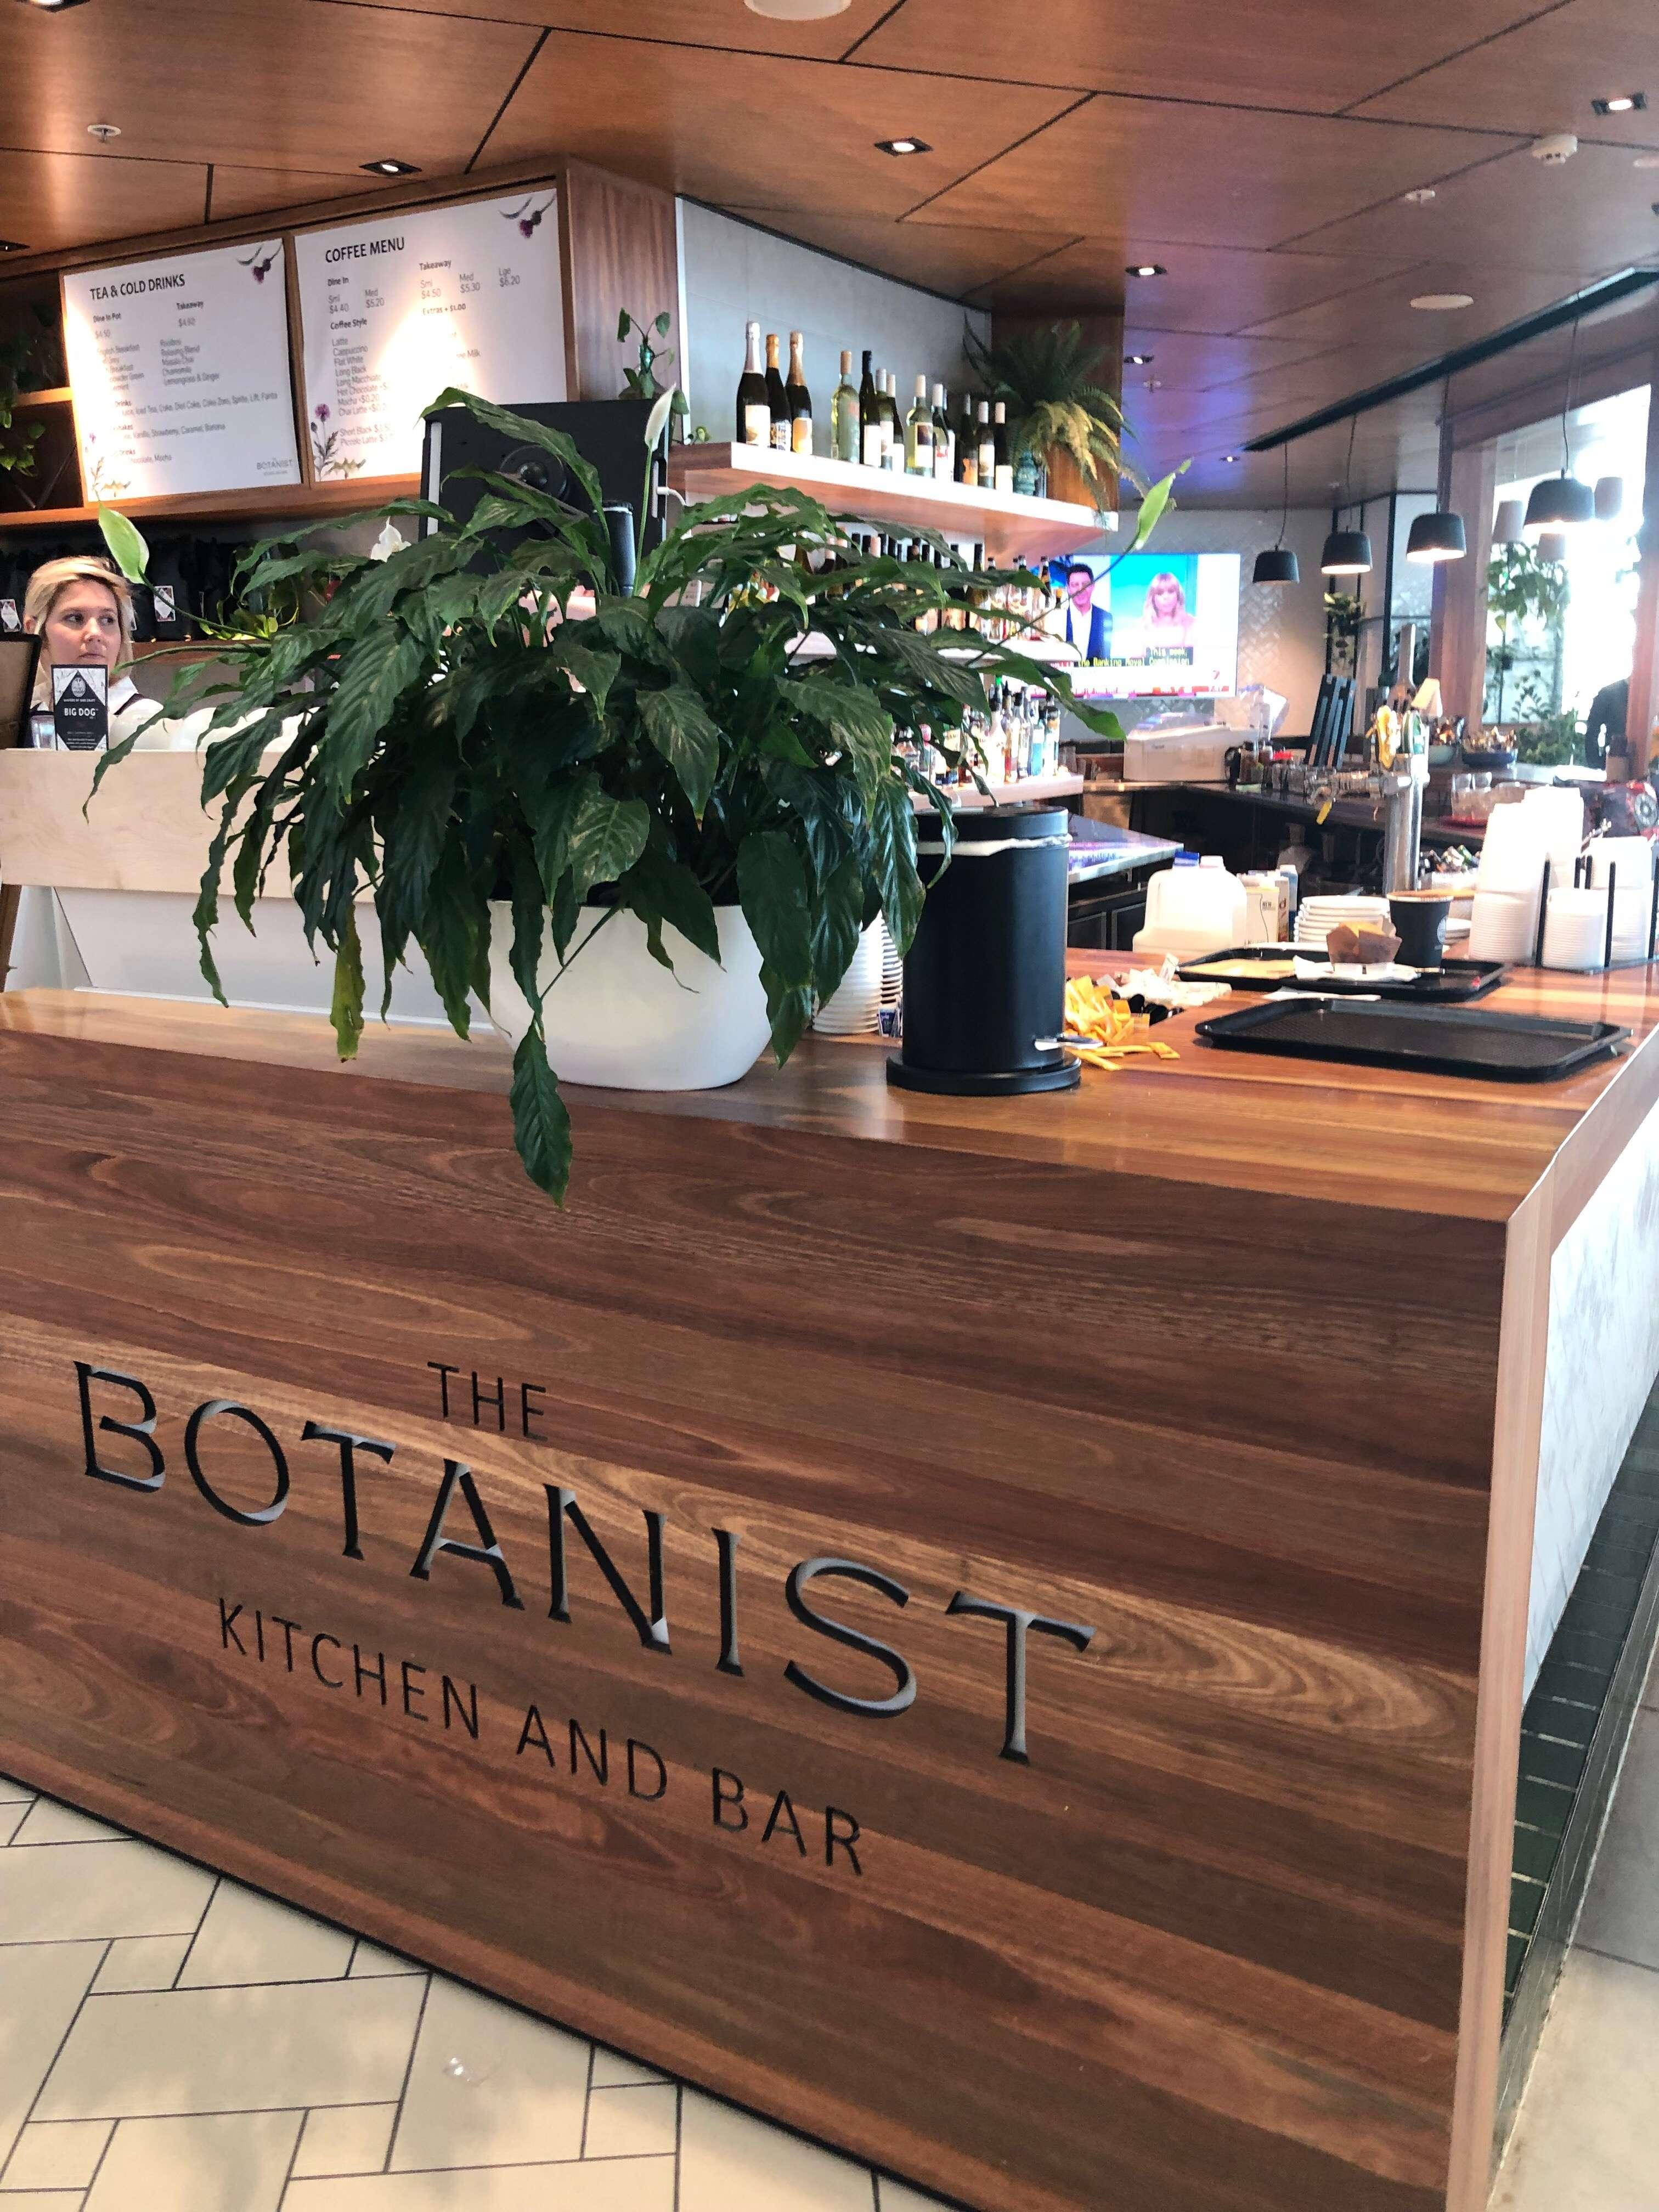 The Botanist Kitchen and Bar